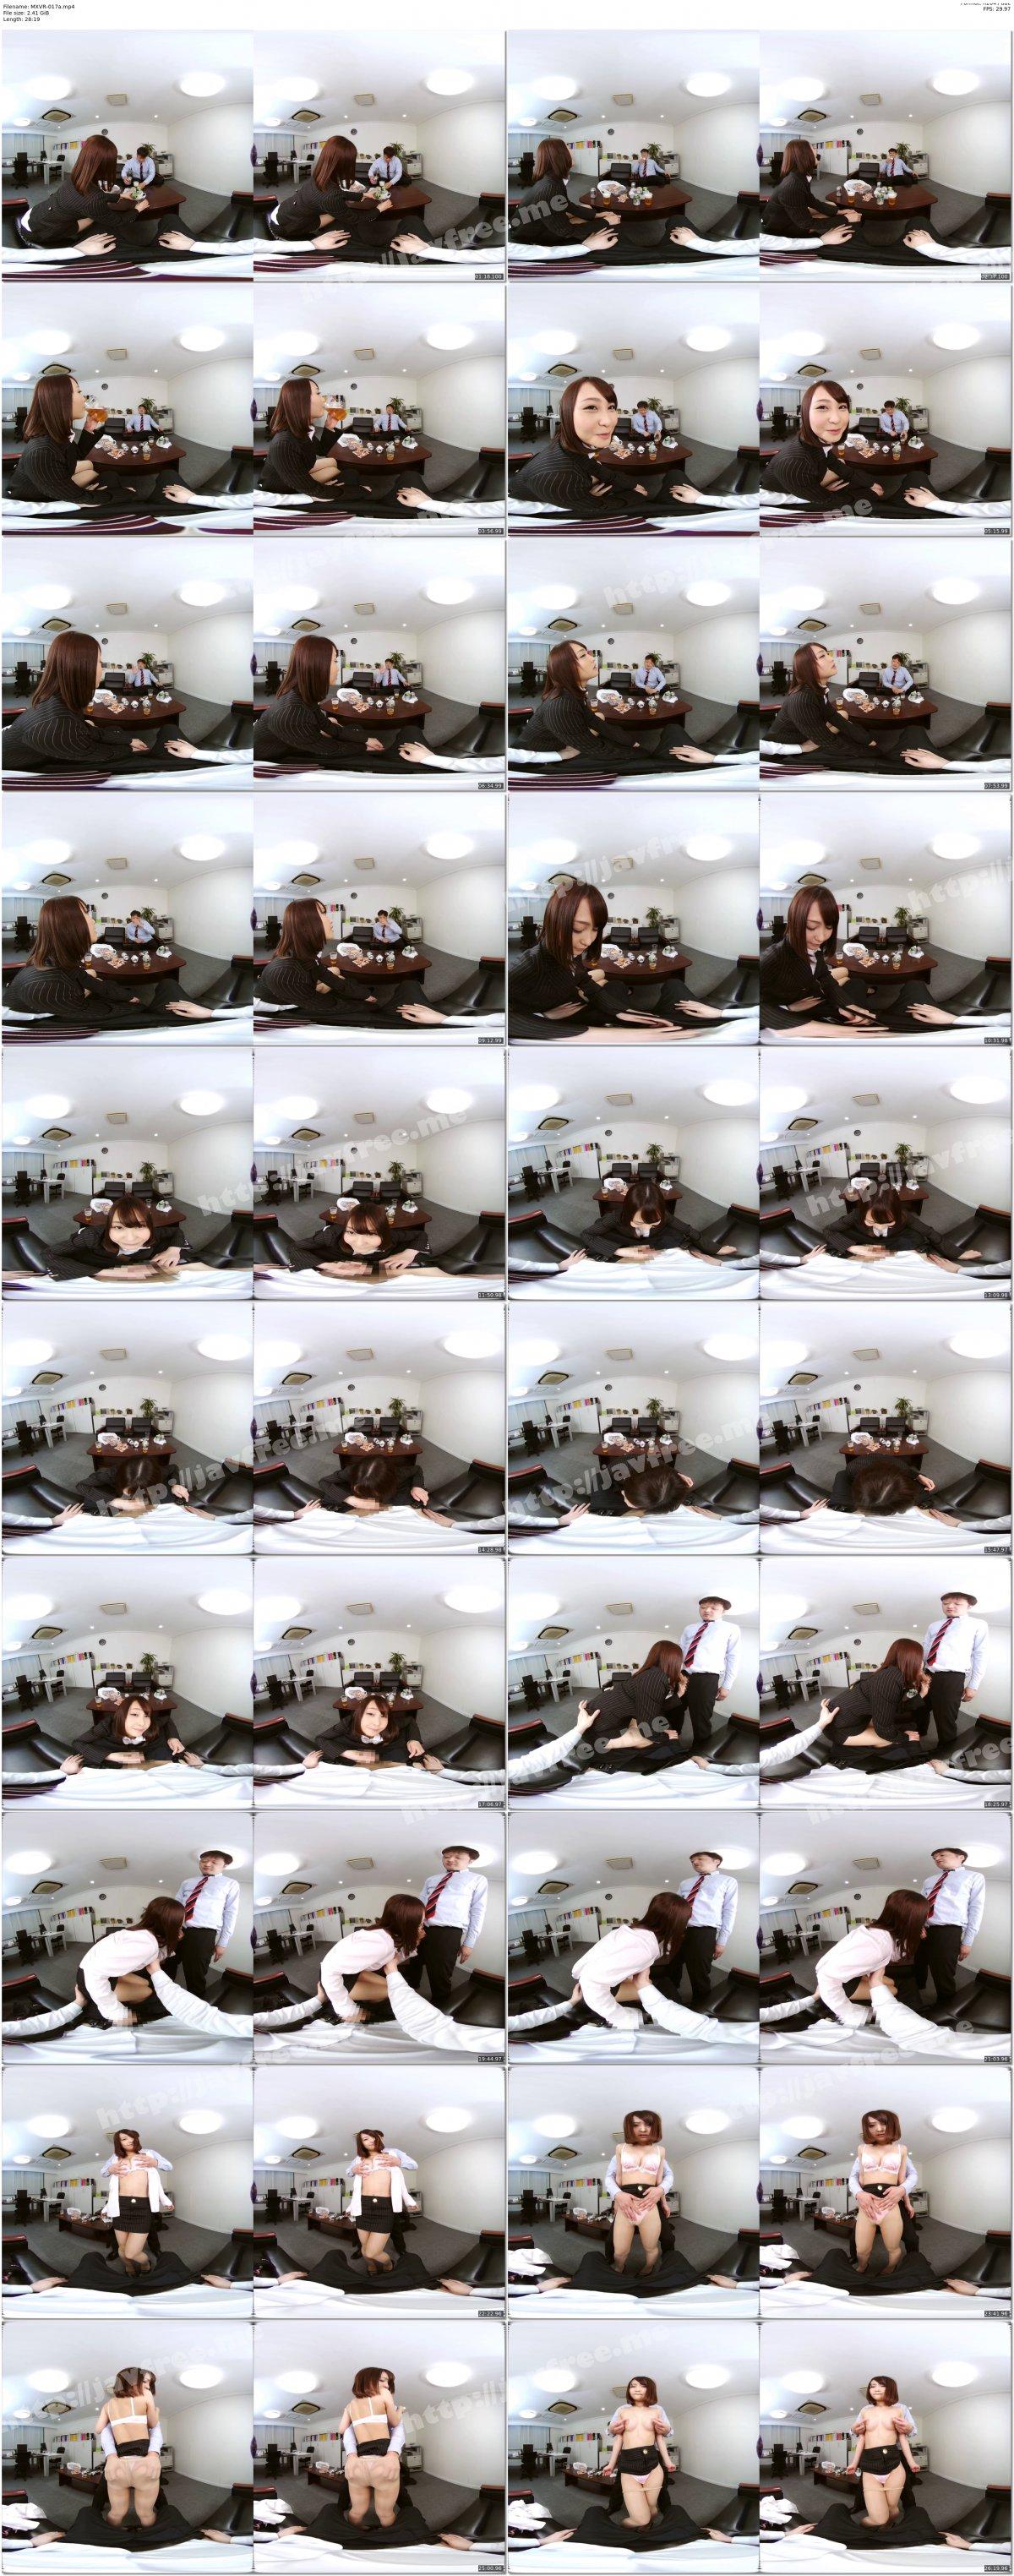 [MXVR-017] 【VR】可愛いお顔が急接近!バックで疲れる彼女の淫顔【咲野の花】 - image MXVR-017a on https://javfree.me